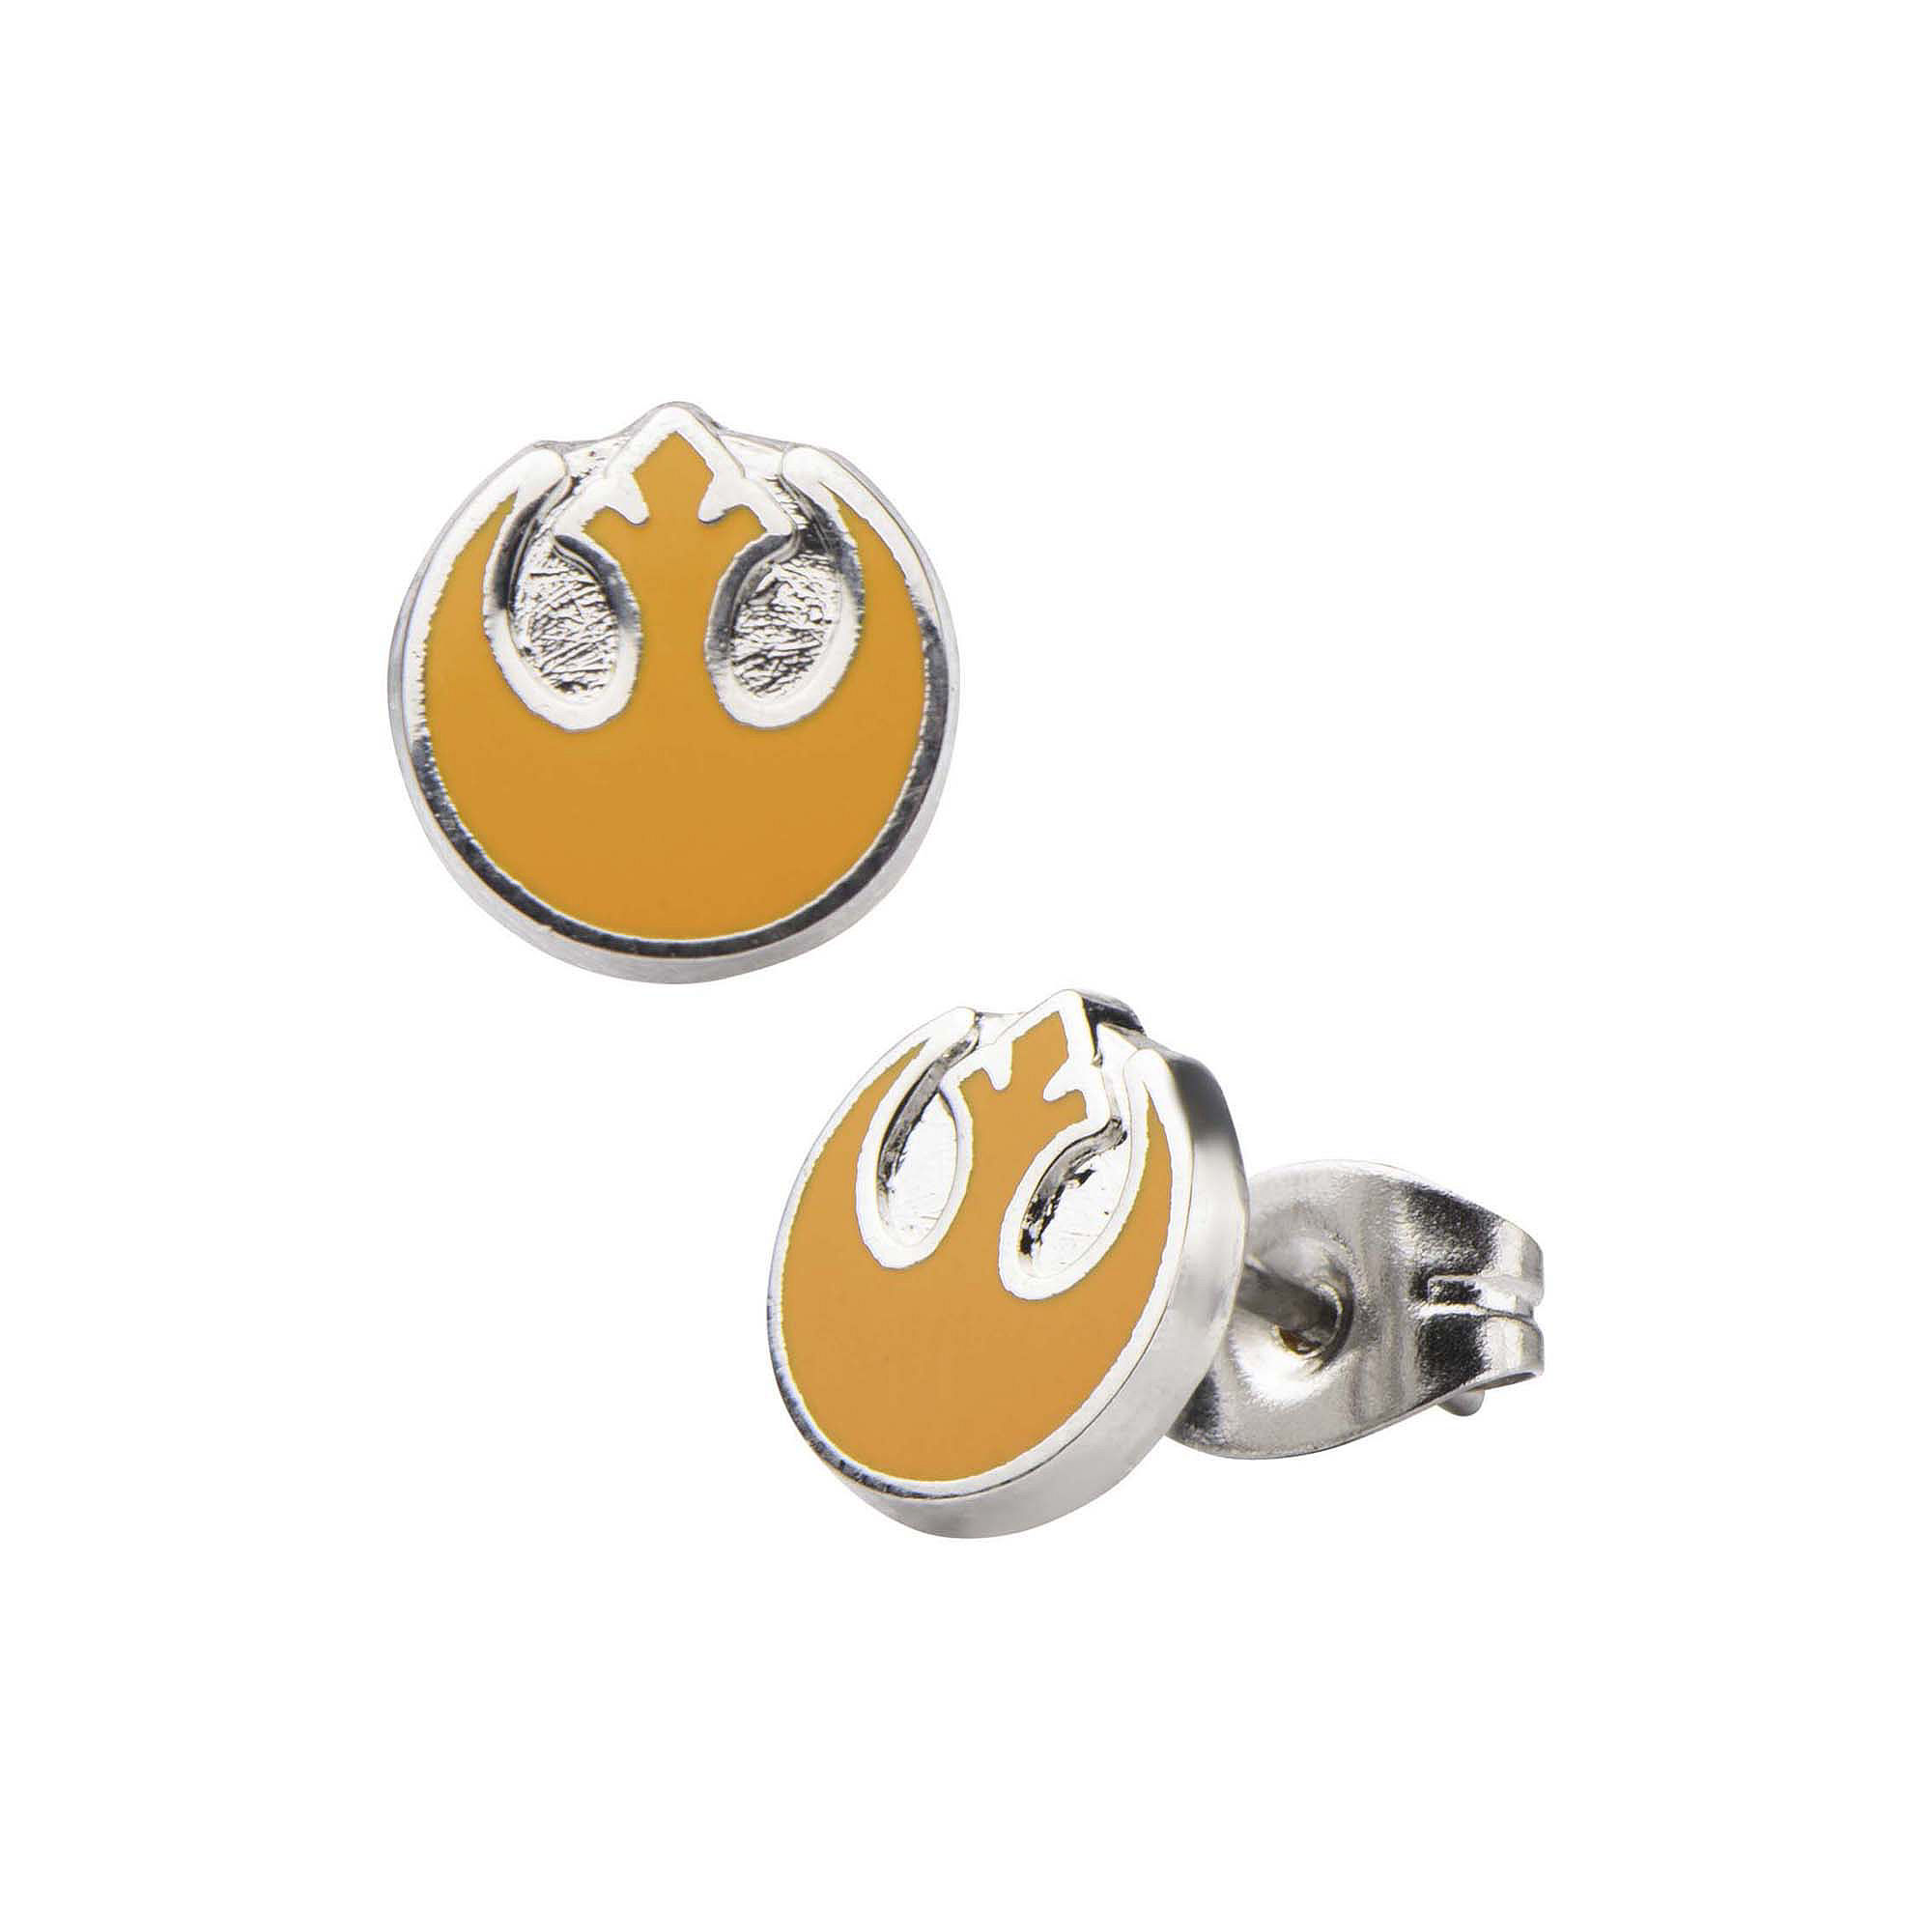 Star Wars Stainless Steel and Enamel Rebel Alliance Stud Earrings